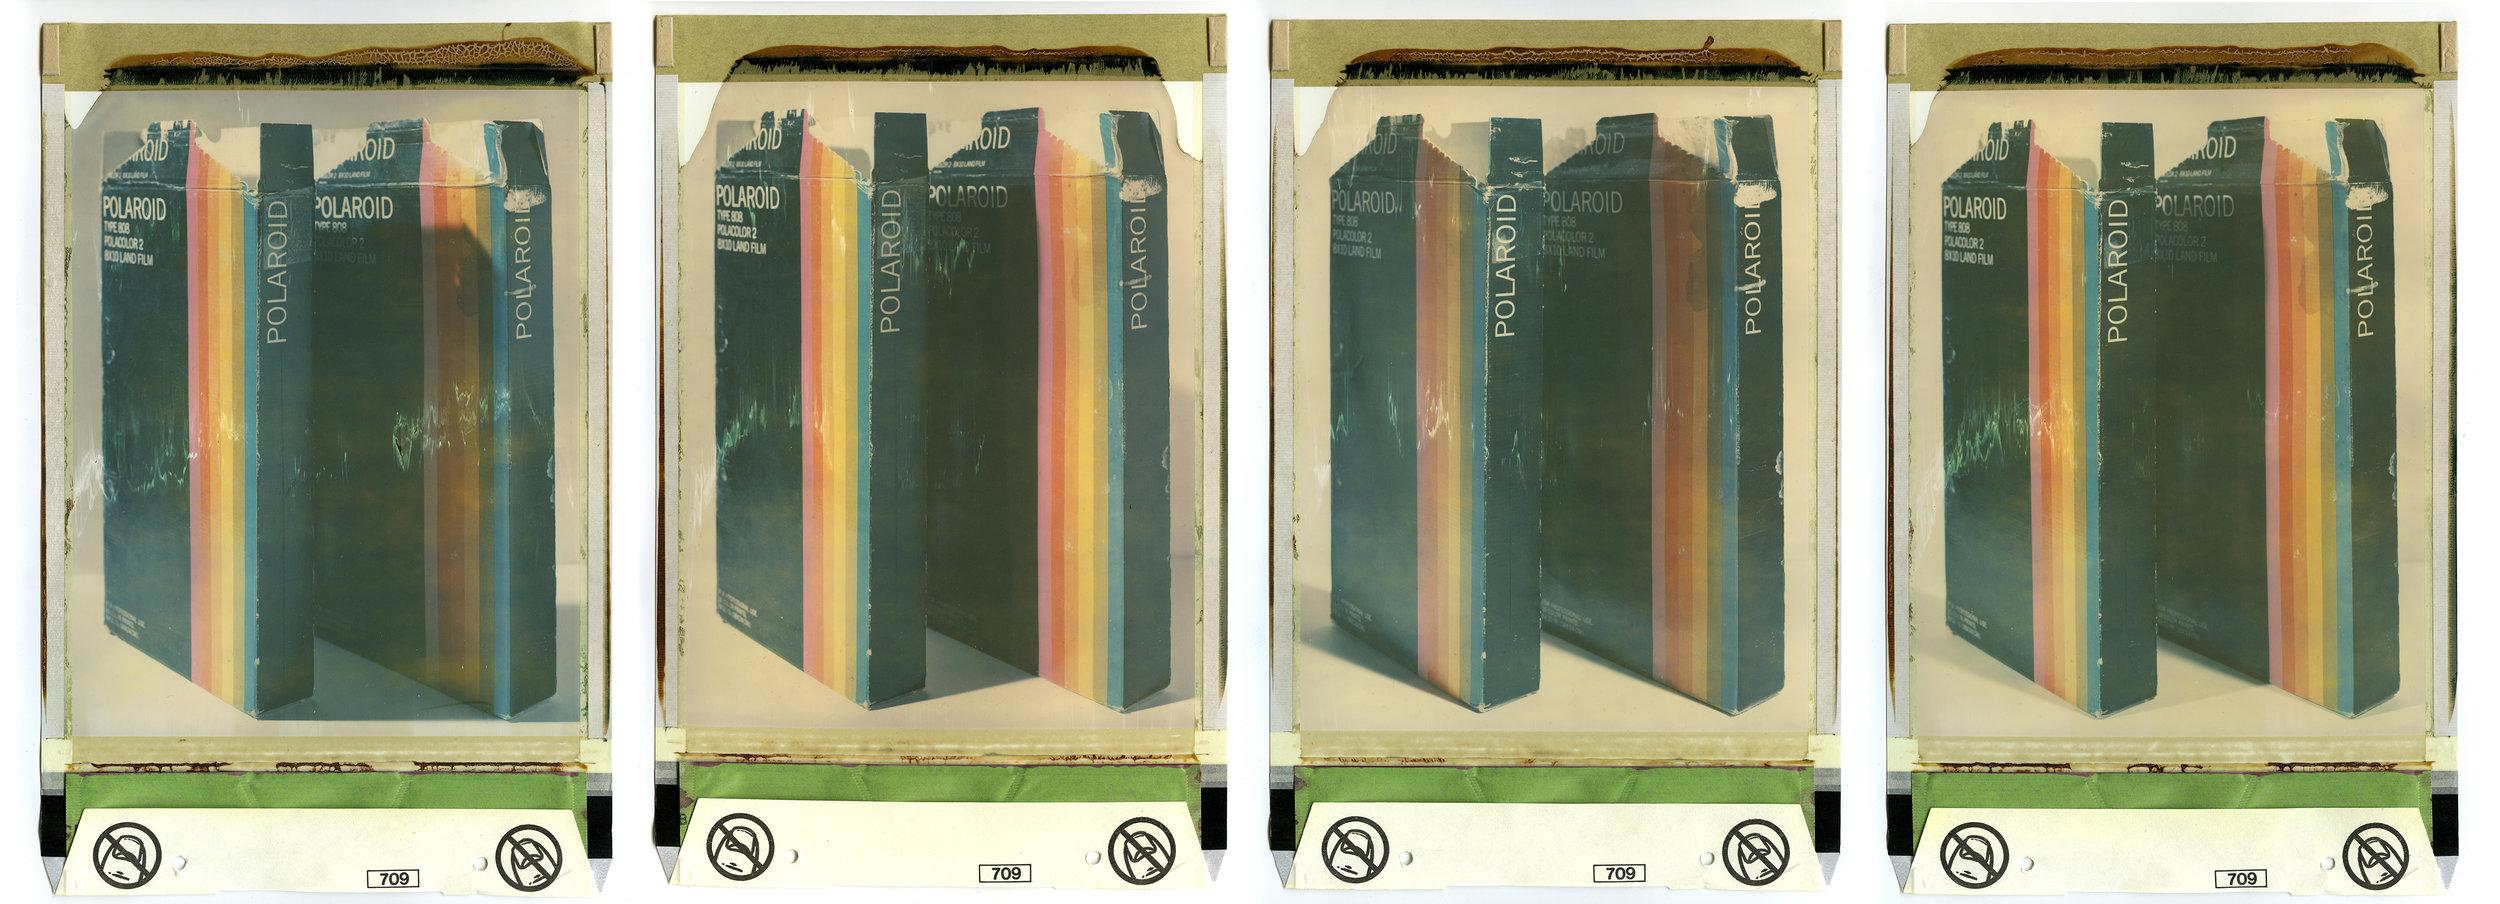 A835190387728B, A835190387728A, A835190387728C, A835190387728D  2014  8 x 10 color polaroid film  13 x 8 1/2 inches